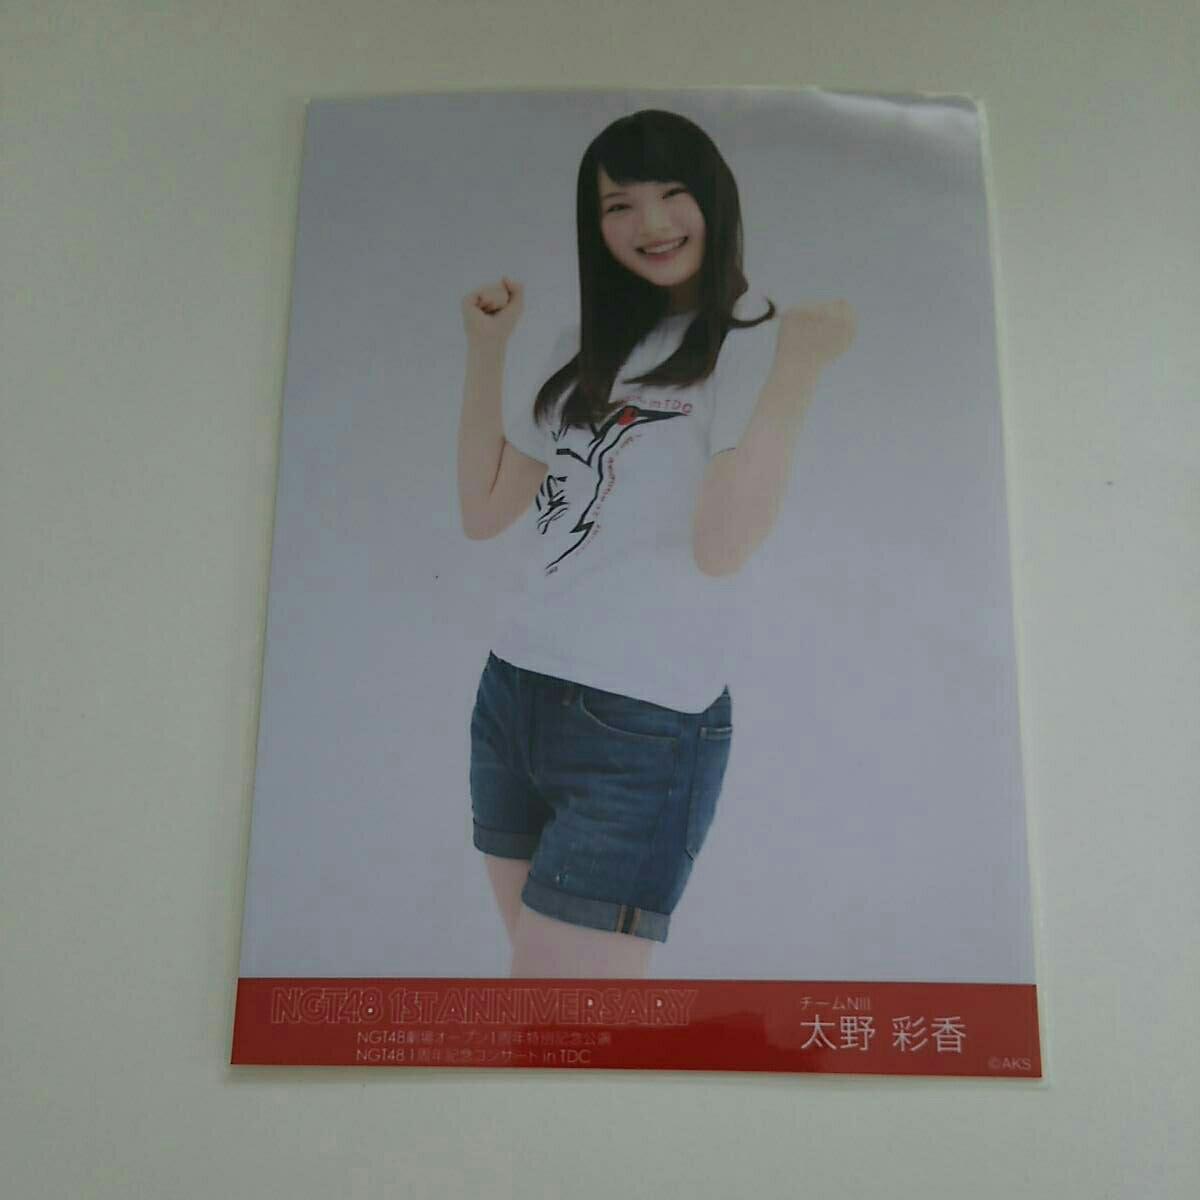 NGT48 太野彩香 1ST ANNIVERSARY DVD/BD 封入 生写真 ライブグッズの画像